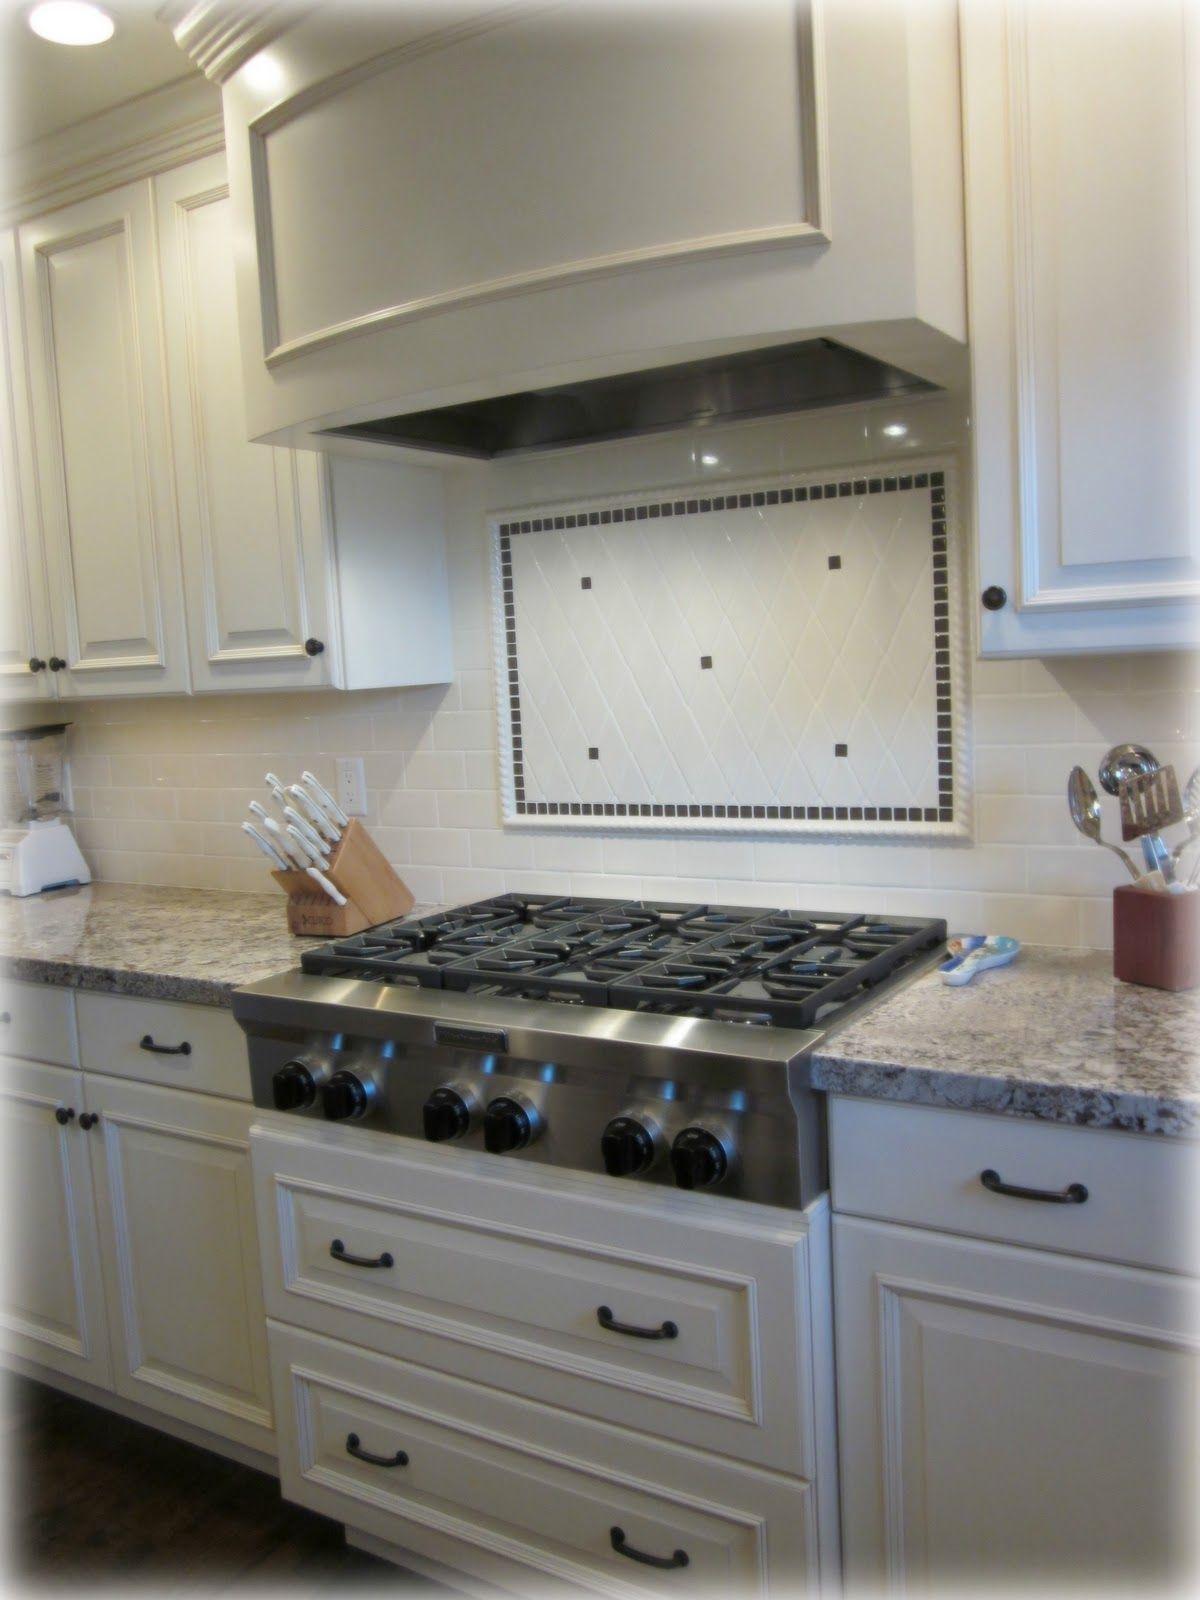 Großartig Küche Renovierung Budget Ideen - Küchenschrank Ideen ...